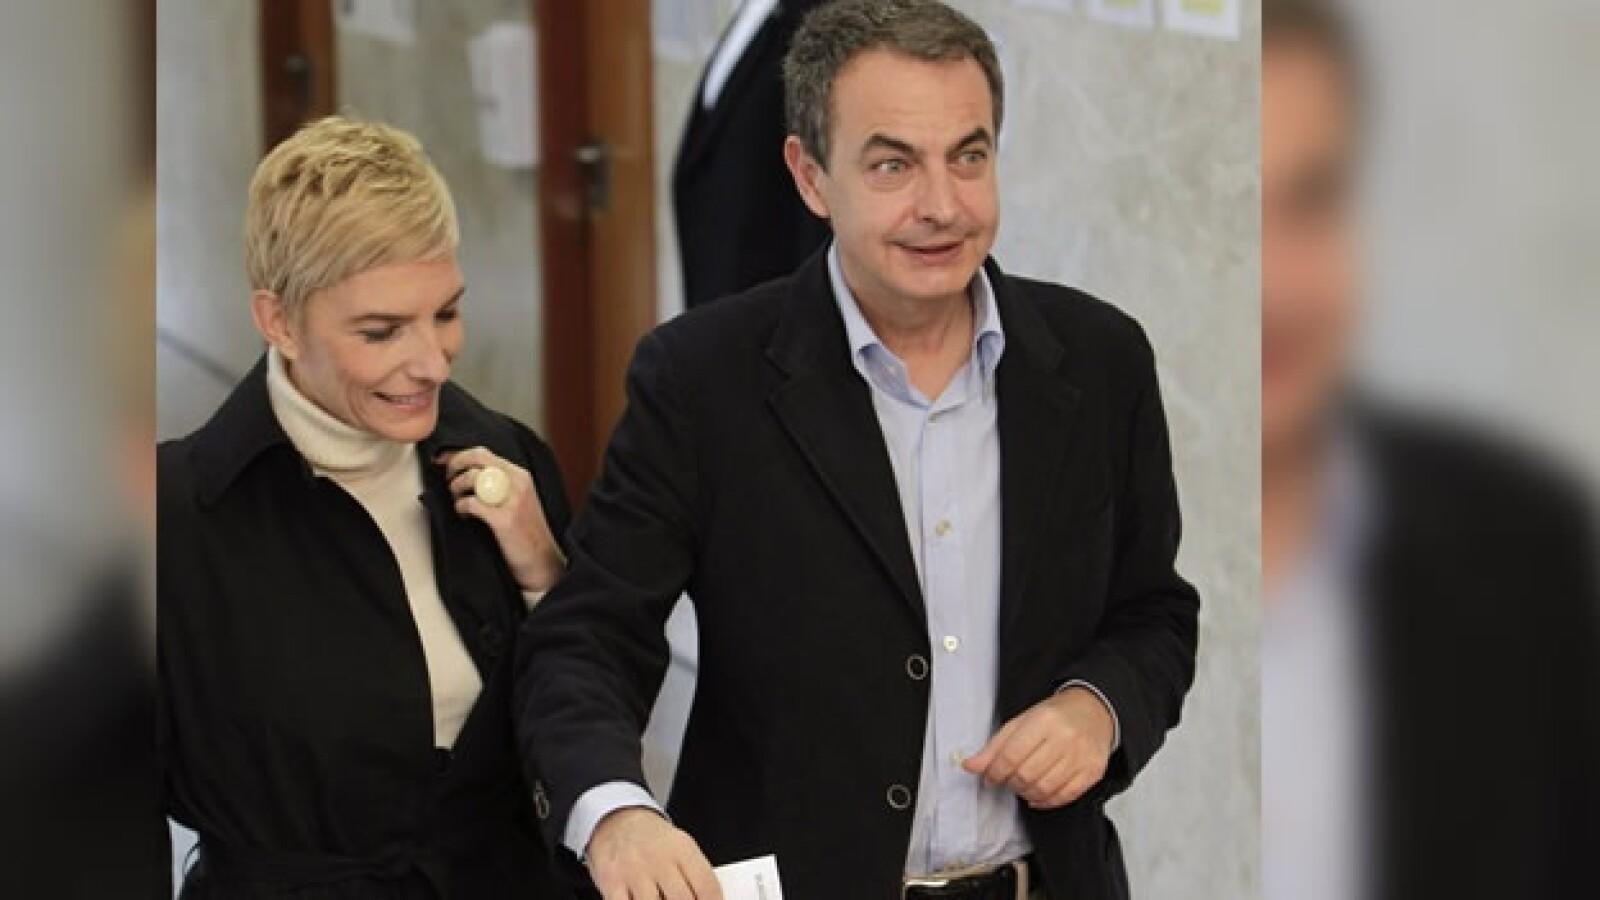 Zapatero presidente espana 20n votos elecciones